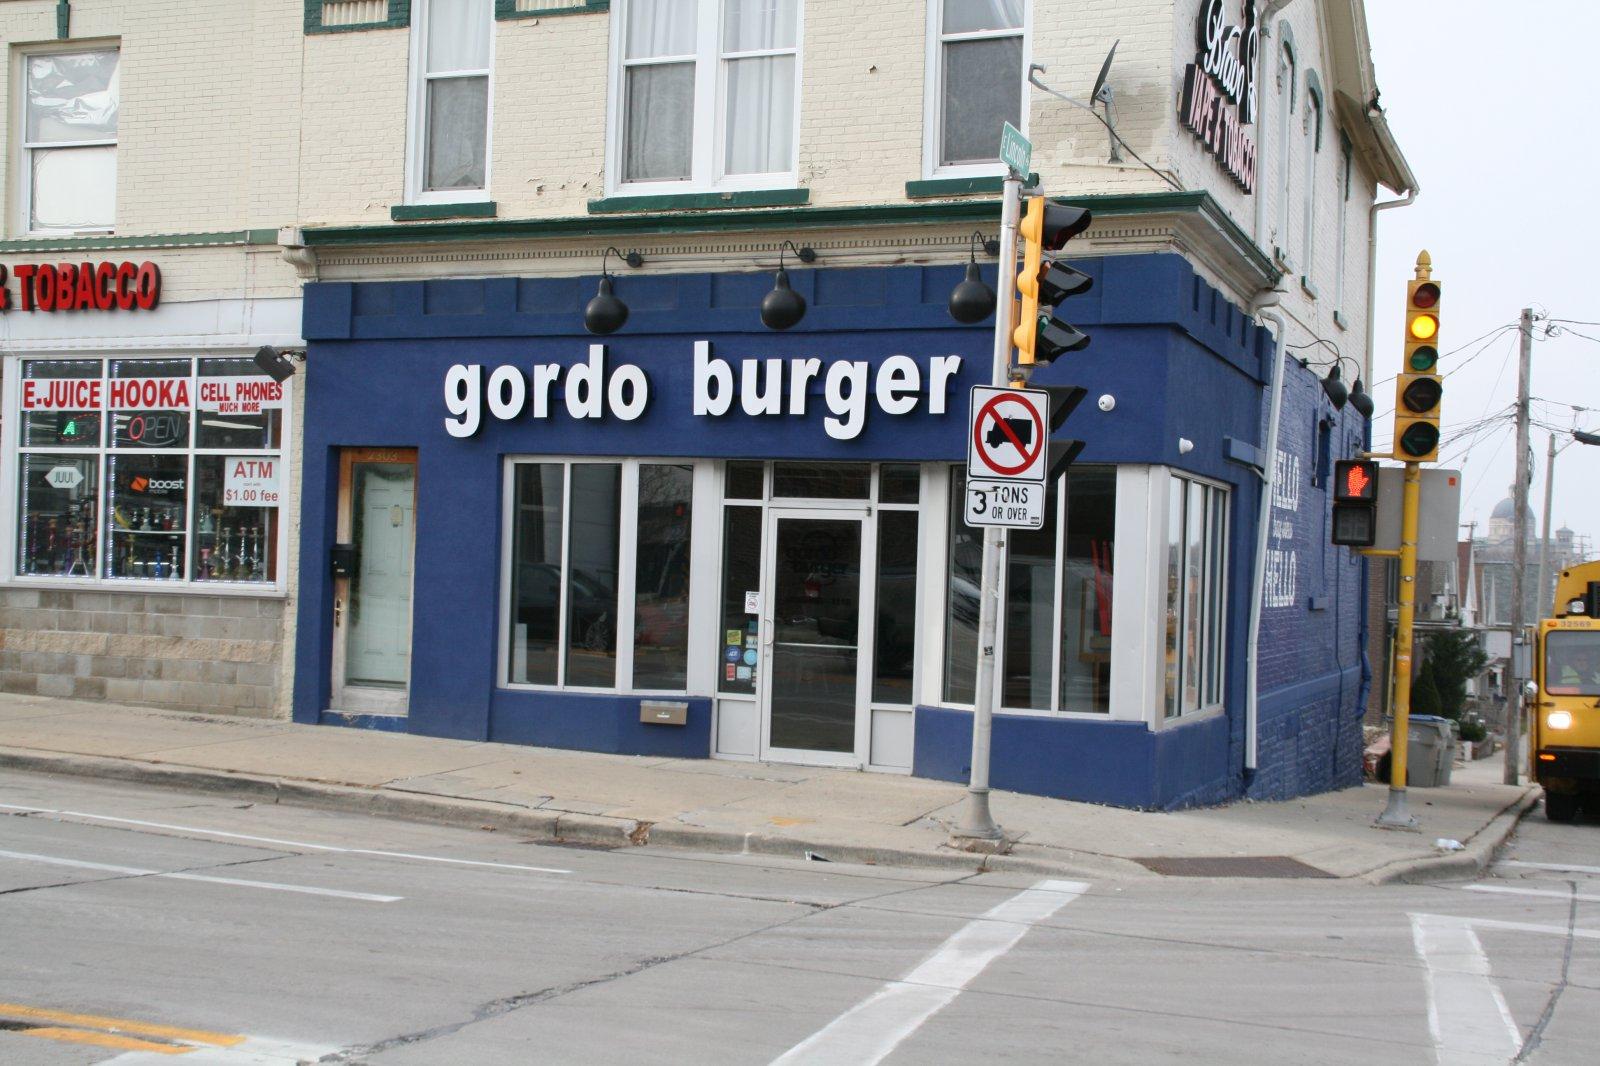 Gordo Burger